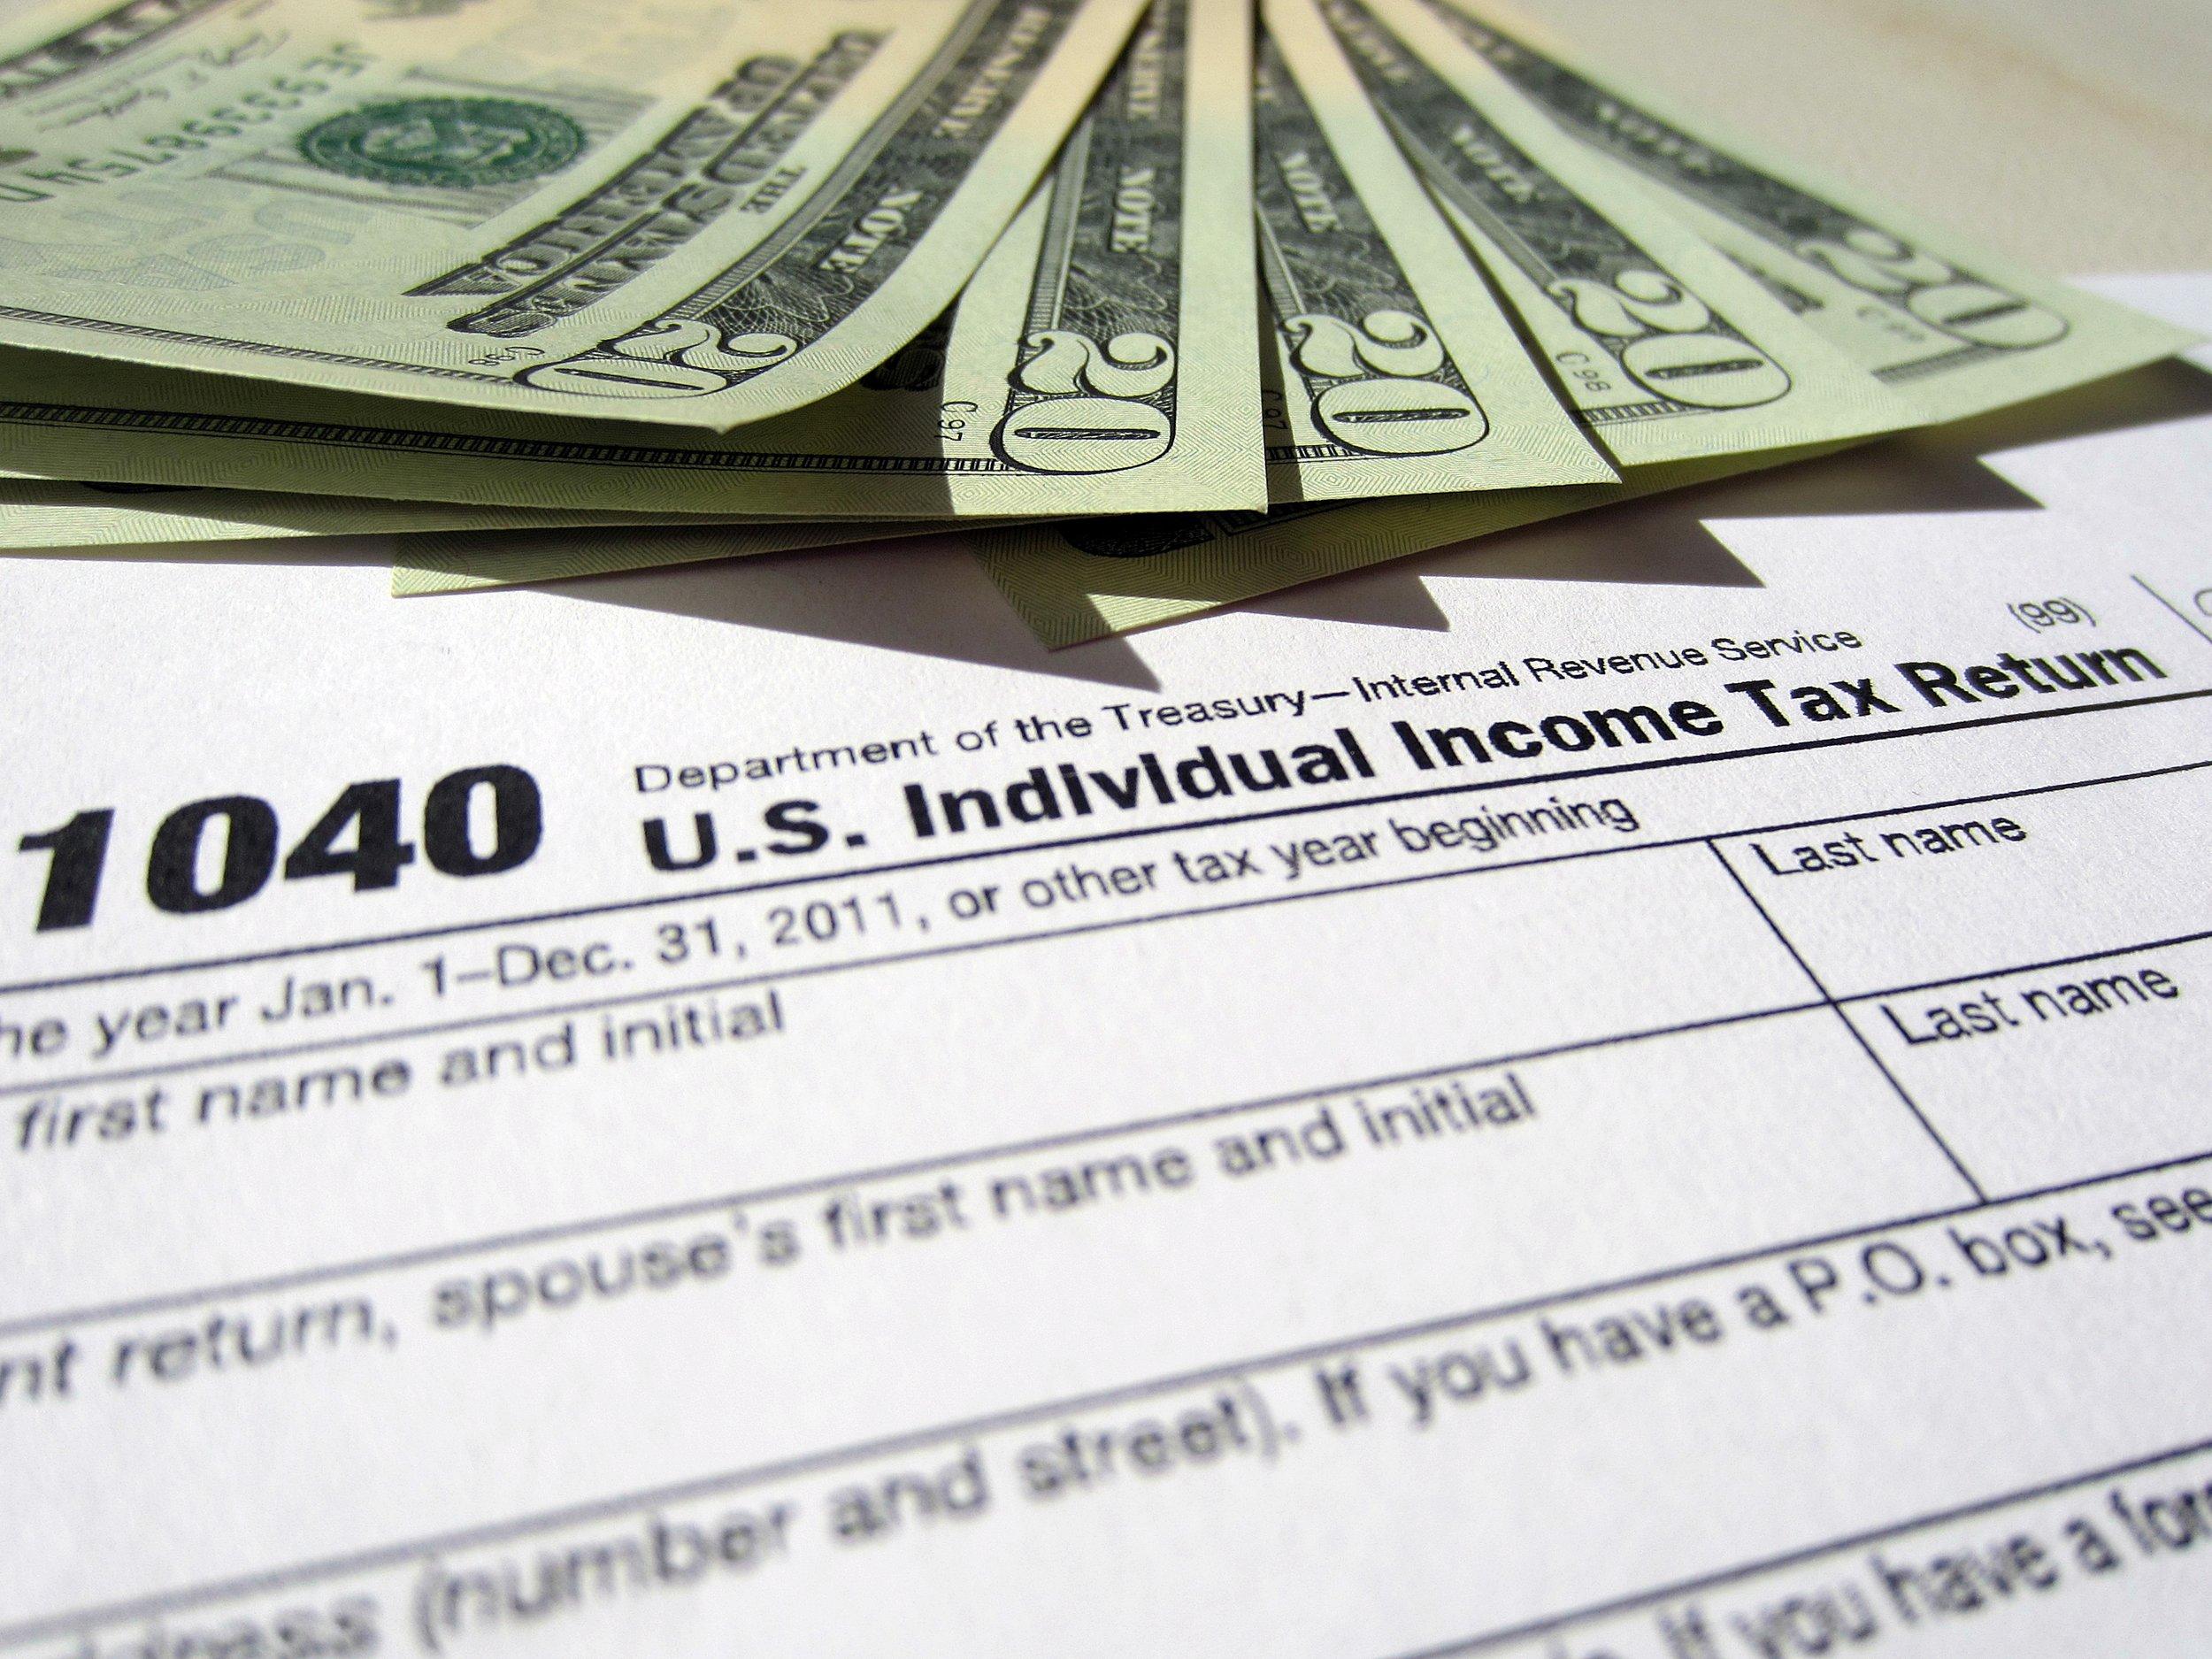 Image courtesy of www.401kcalculator.org/